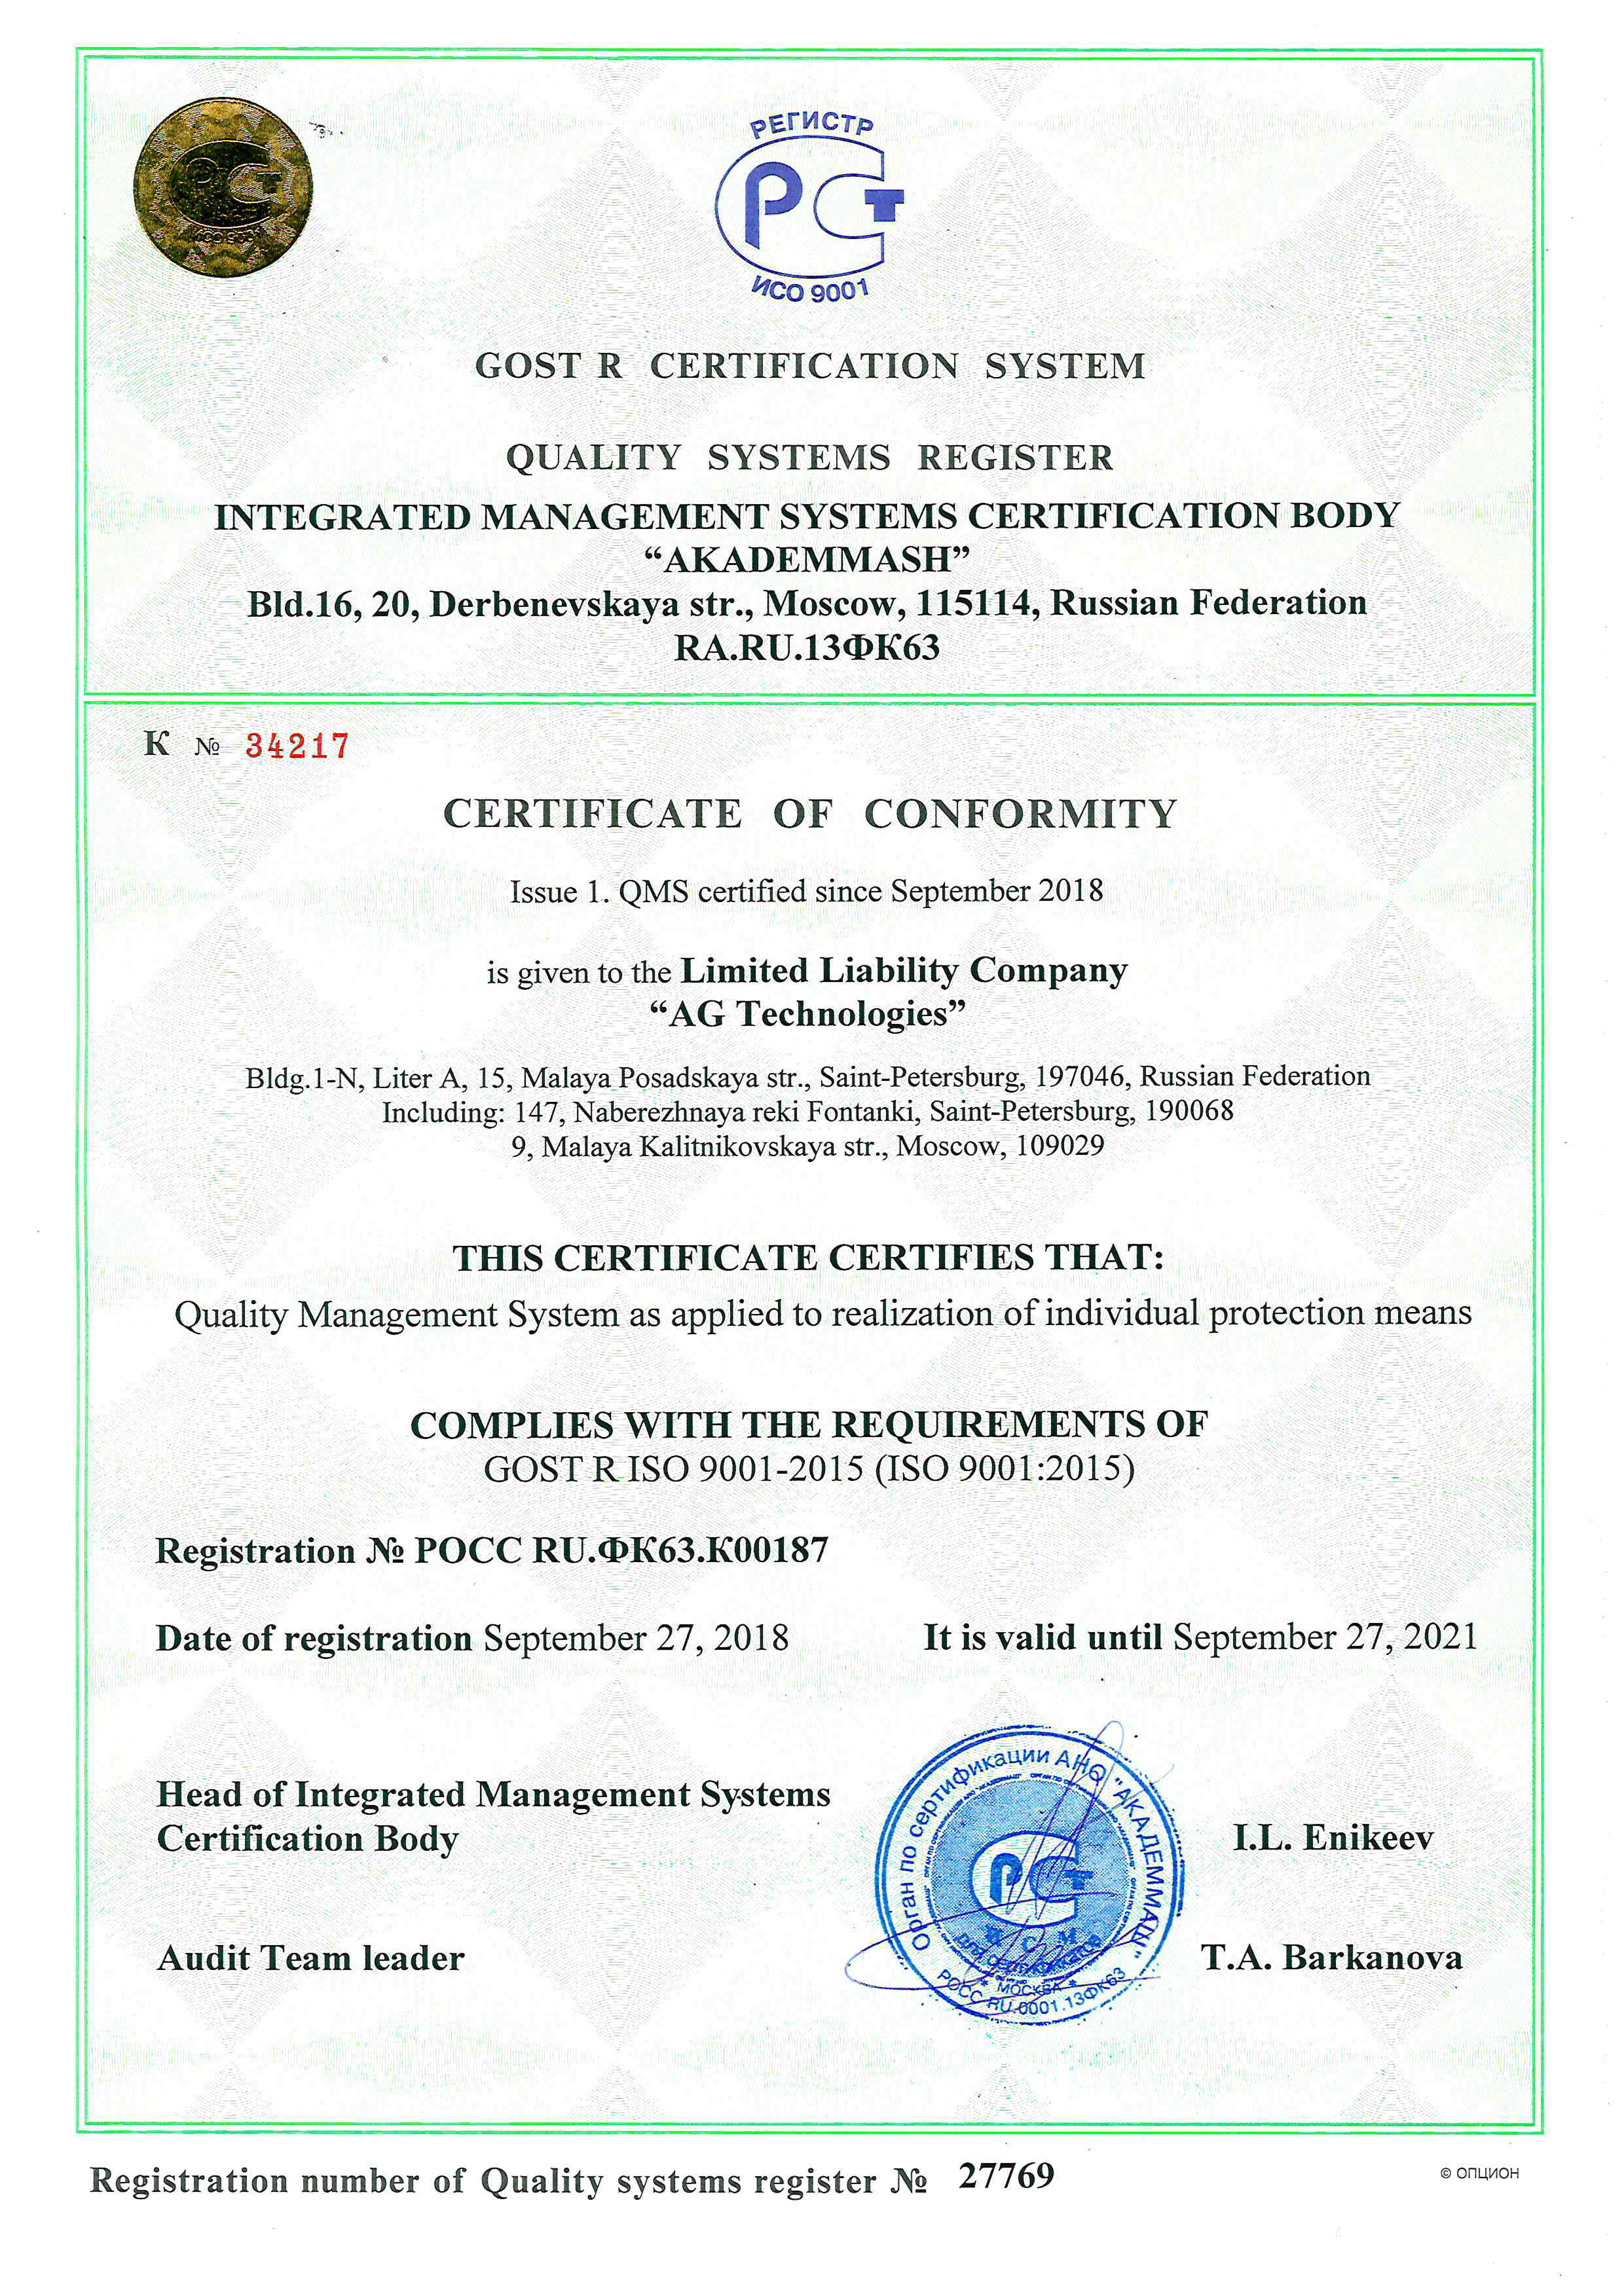 AG-Technologies ISO 9001